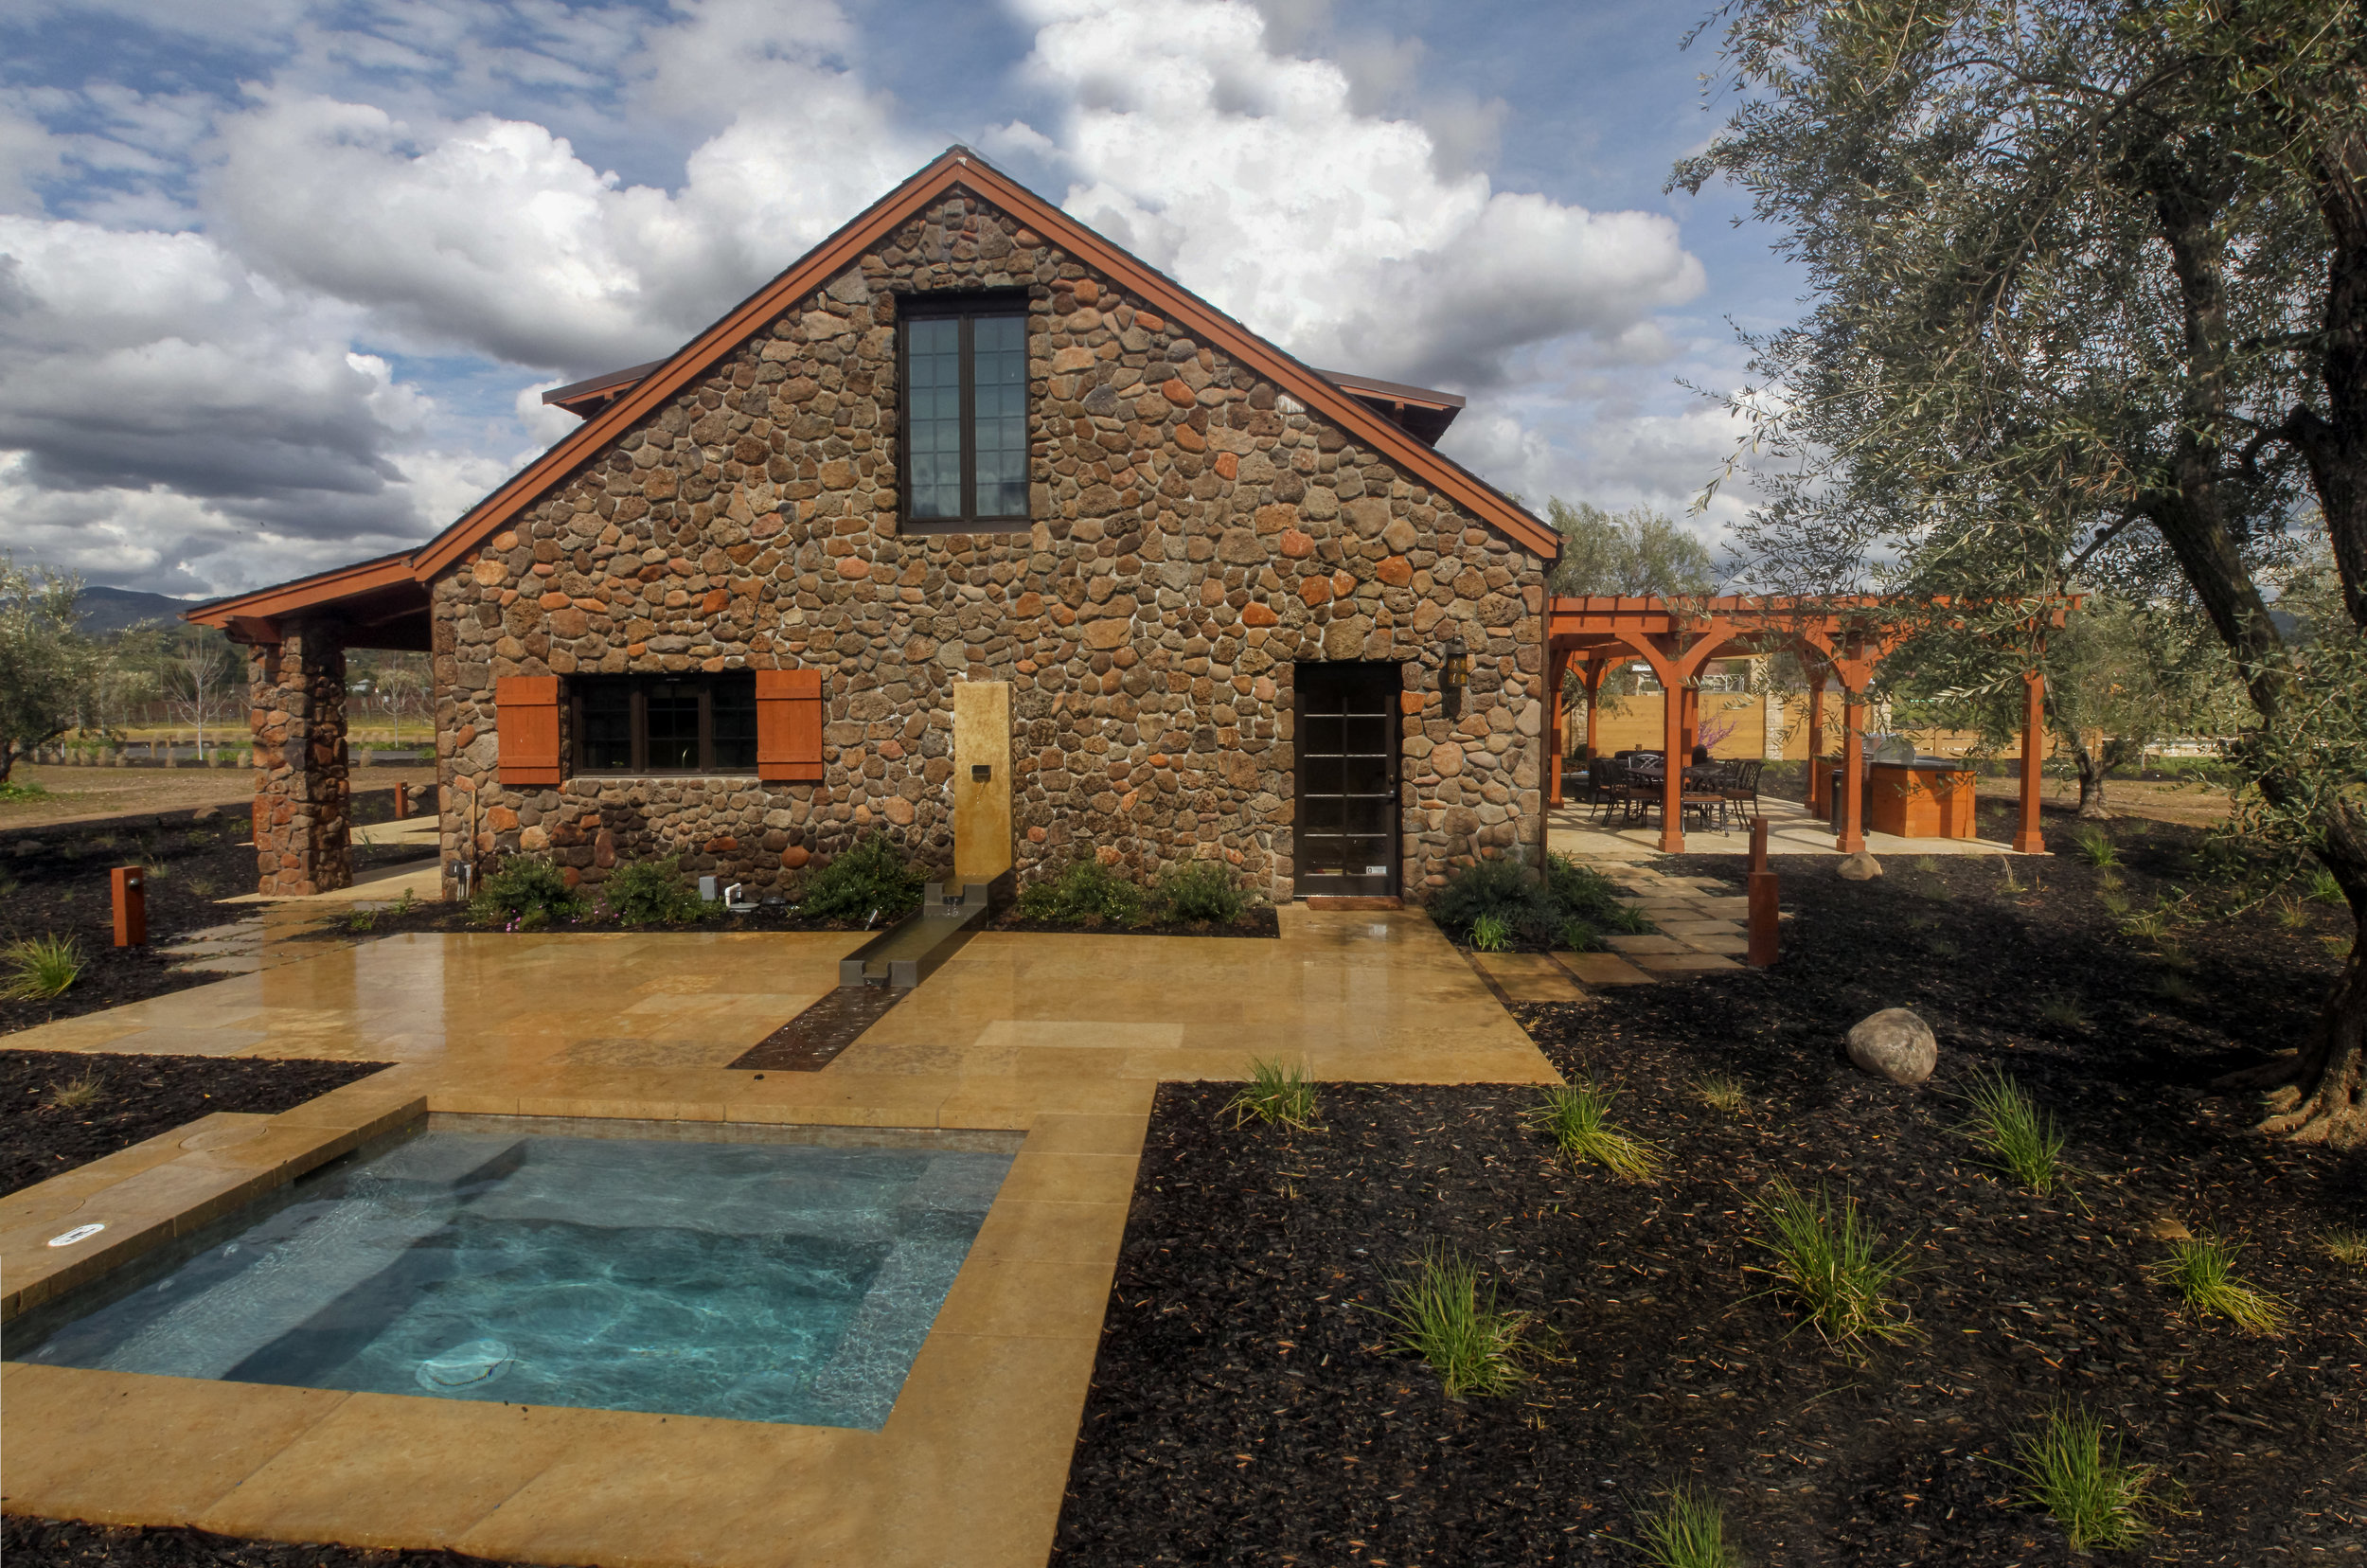 4th stone cottage edited.jpg